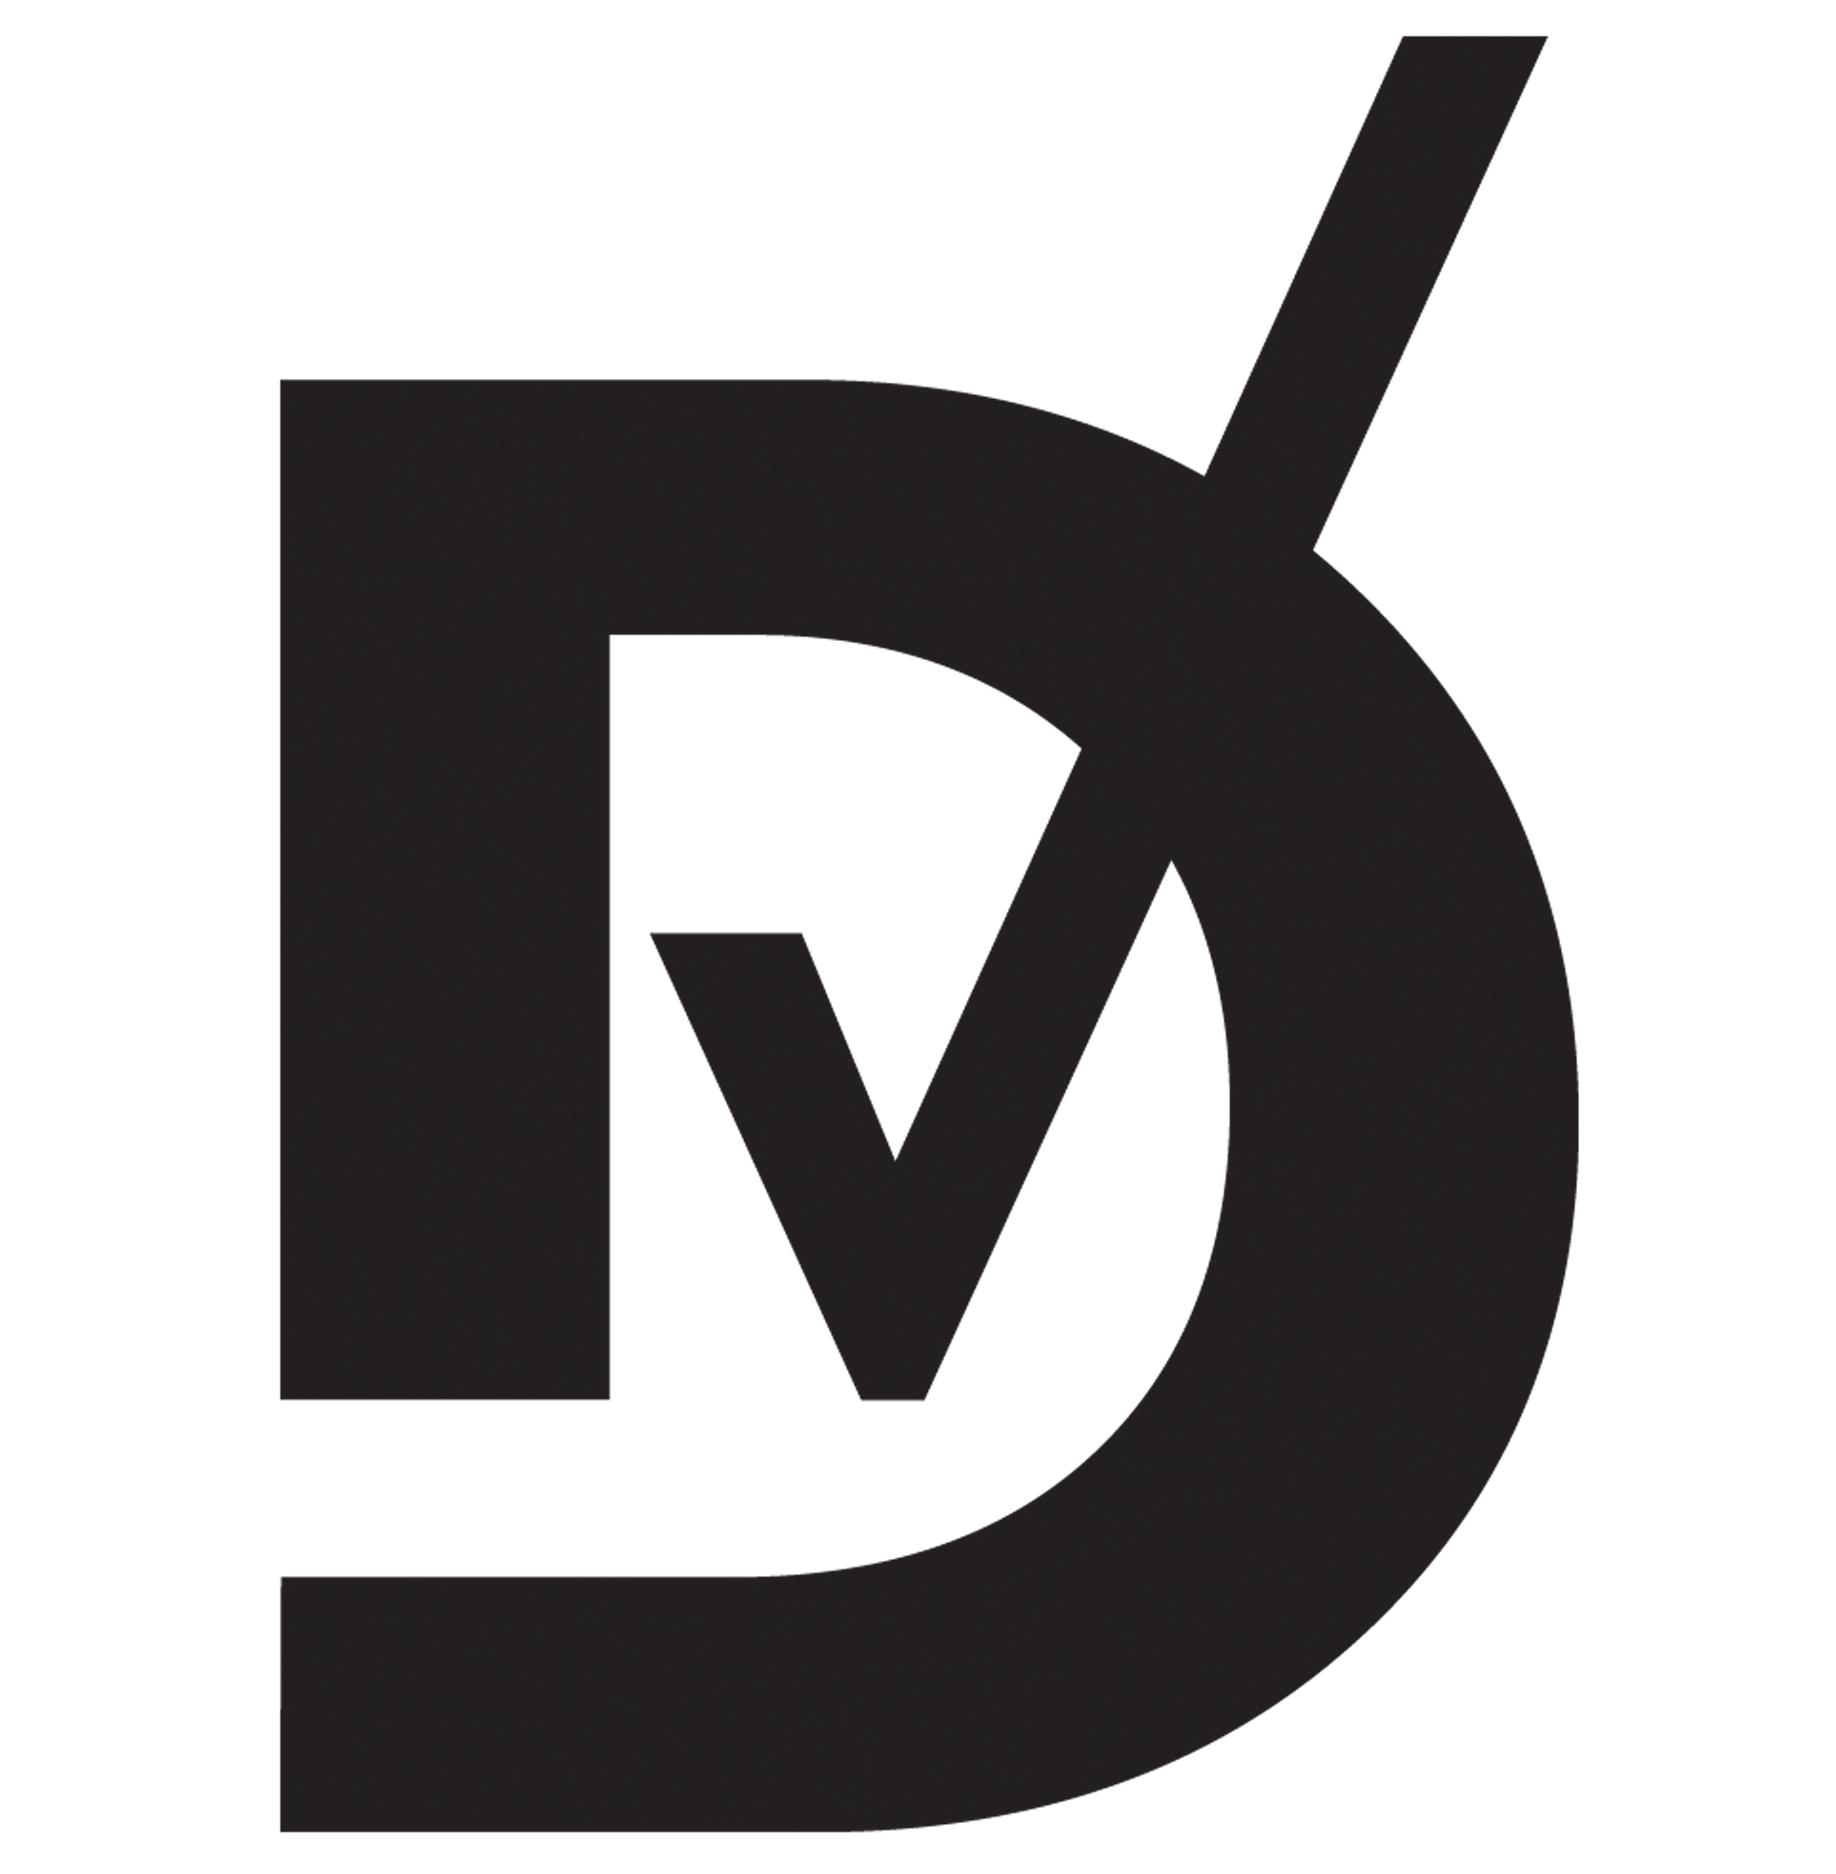 DileVale